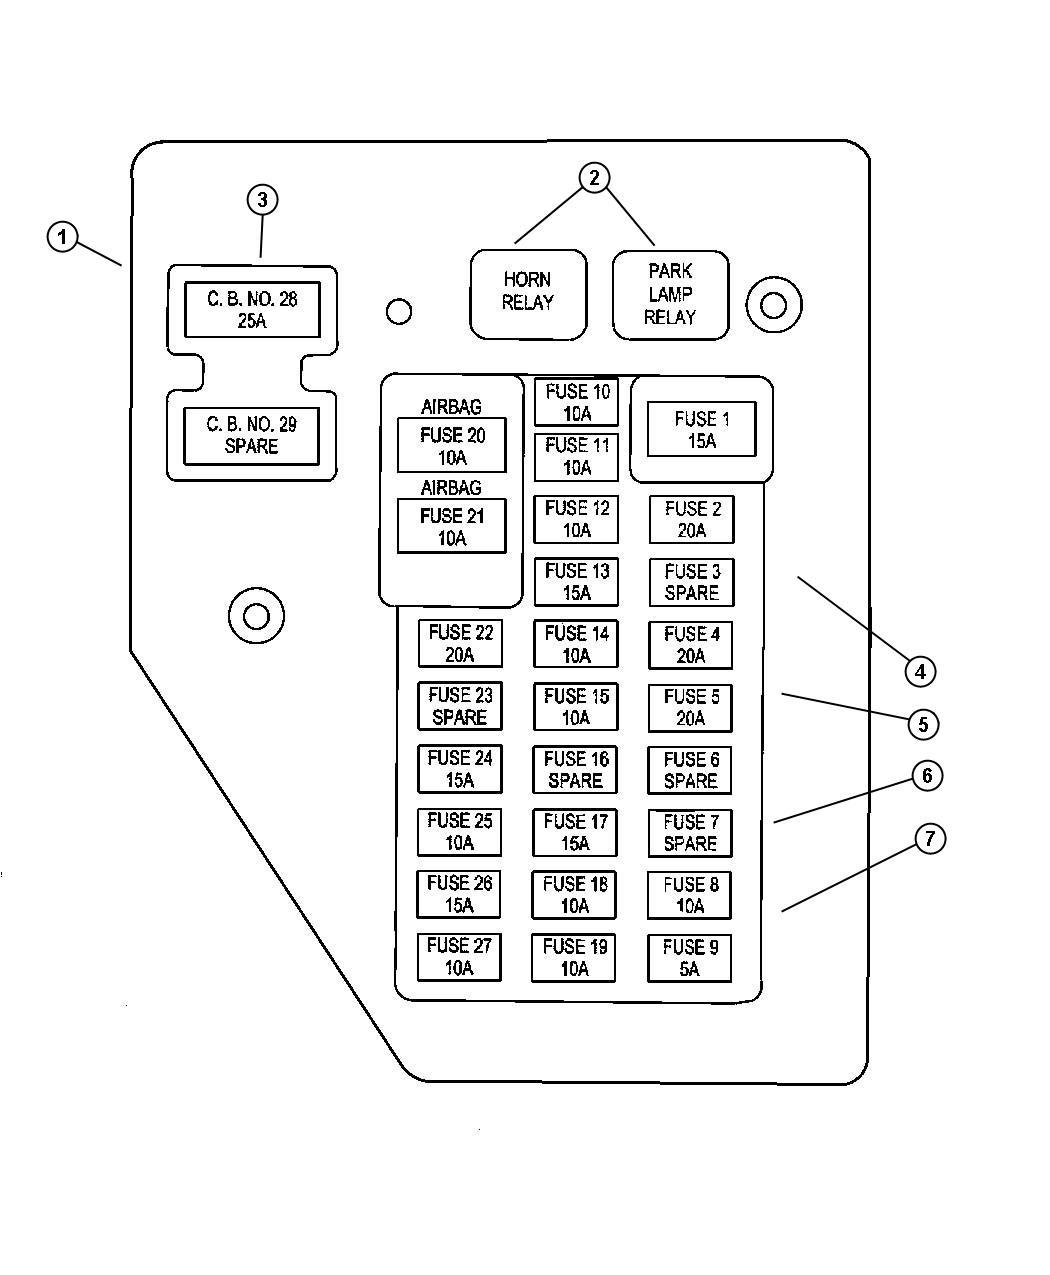 Fine 95 Dodge Dakota Fuse Diagram Basic Electronics Wiring Diagram Wiring Cloud Overrenstrafr09Org